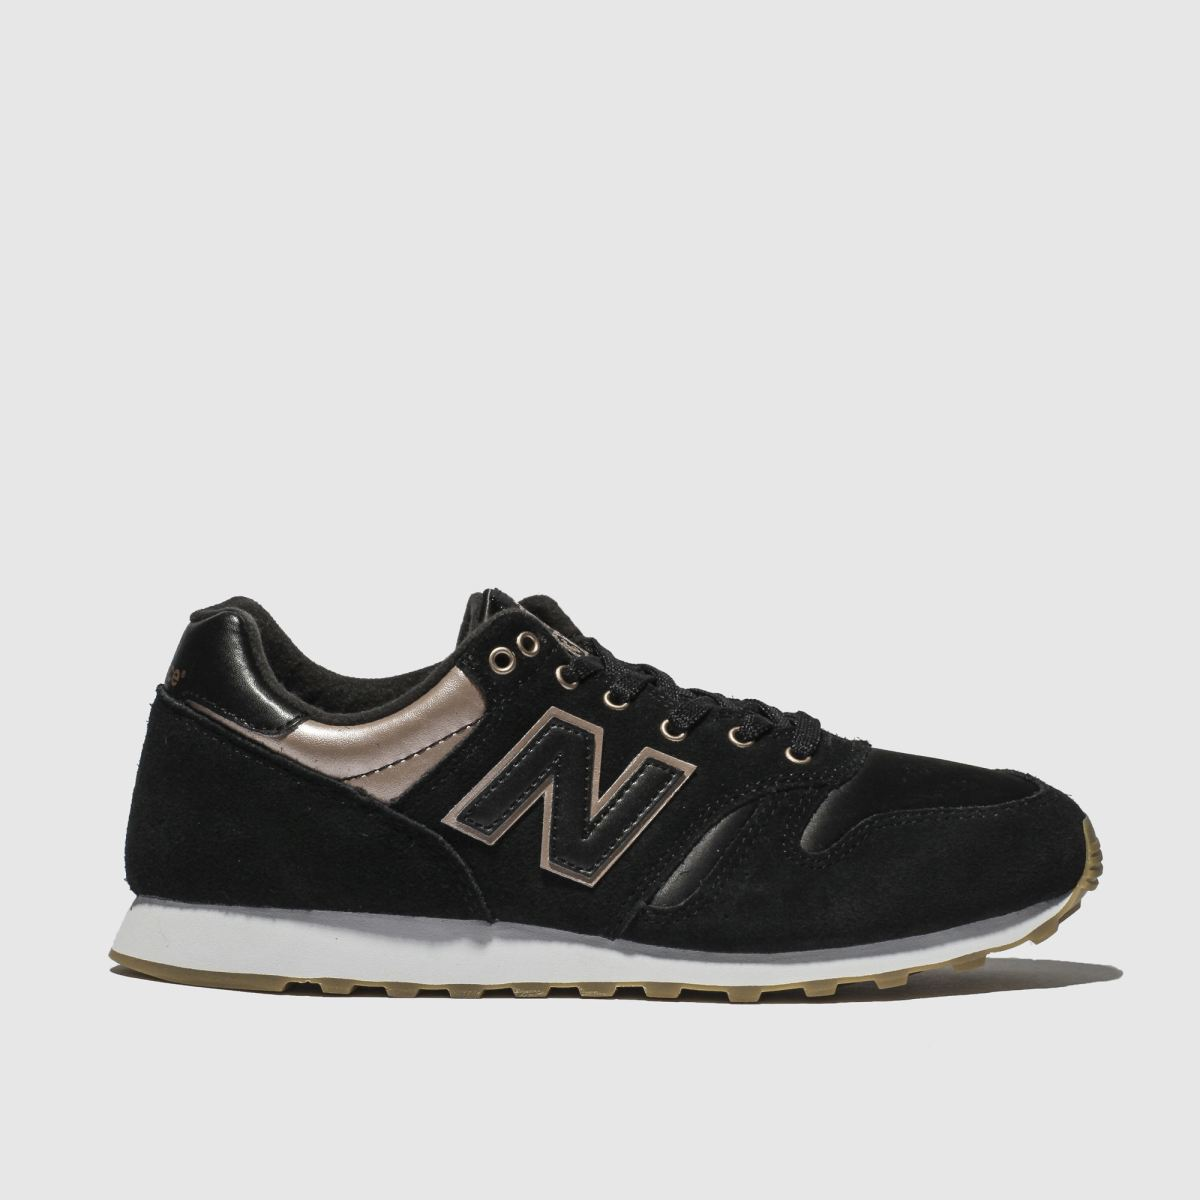 New Balance New Balance Black & Gold 373 Metallic Trainers